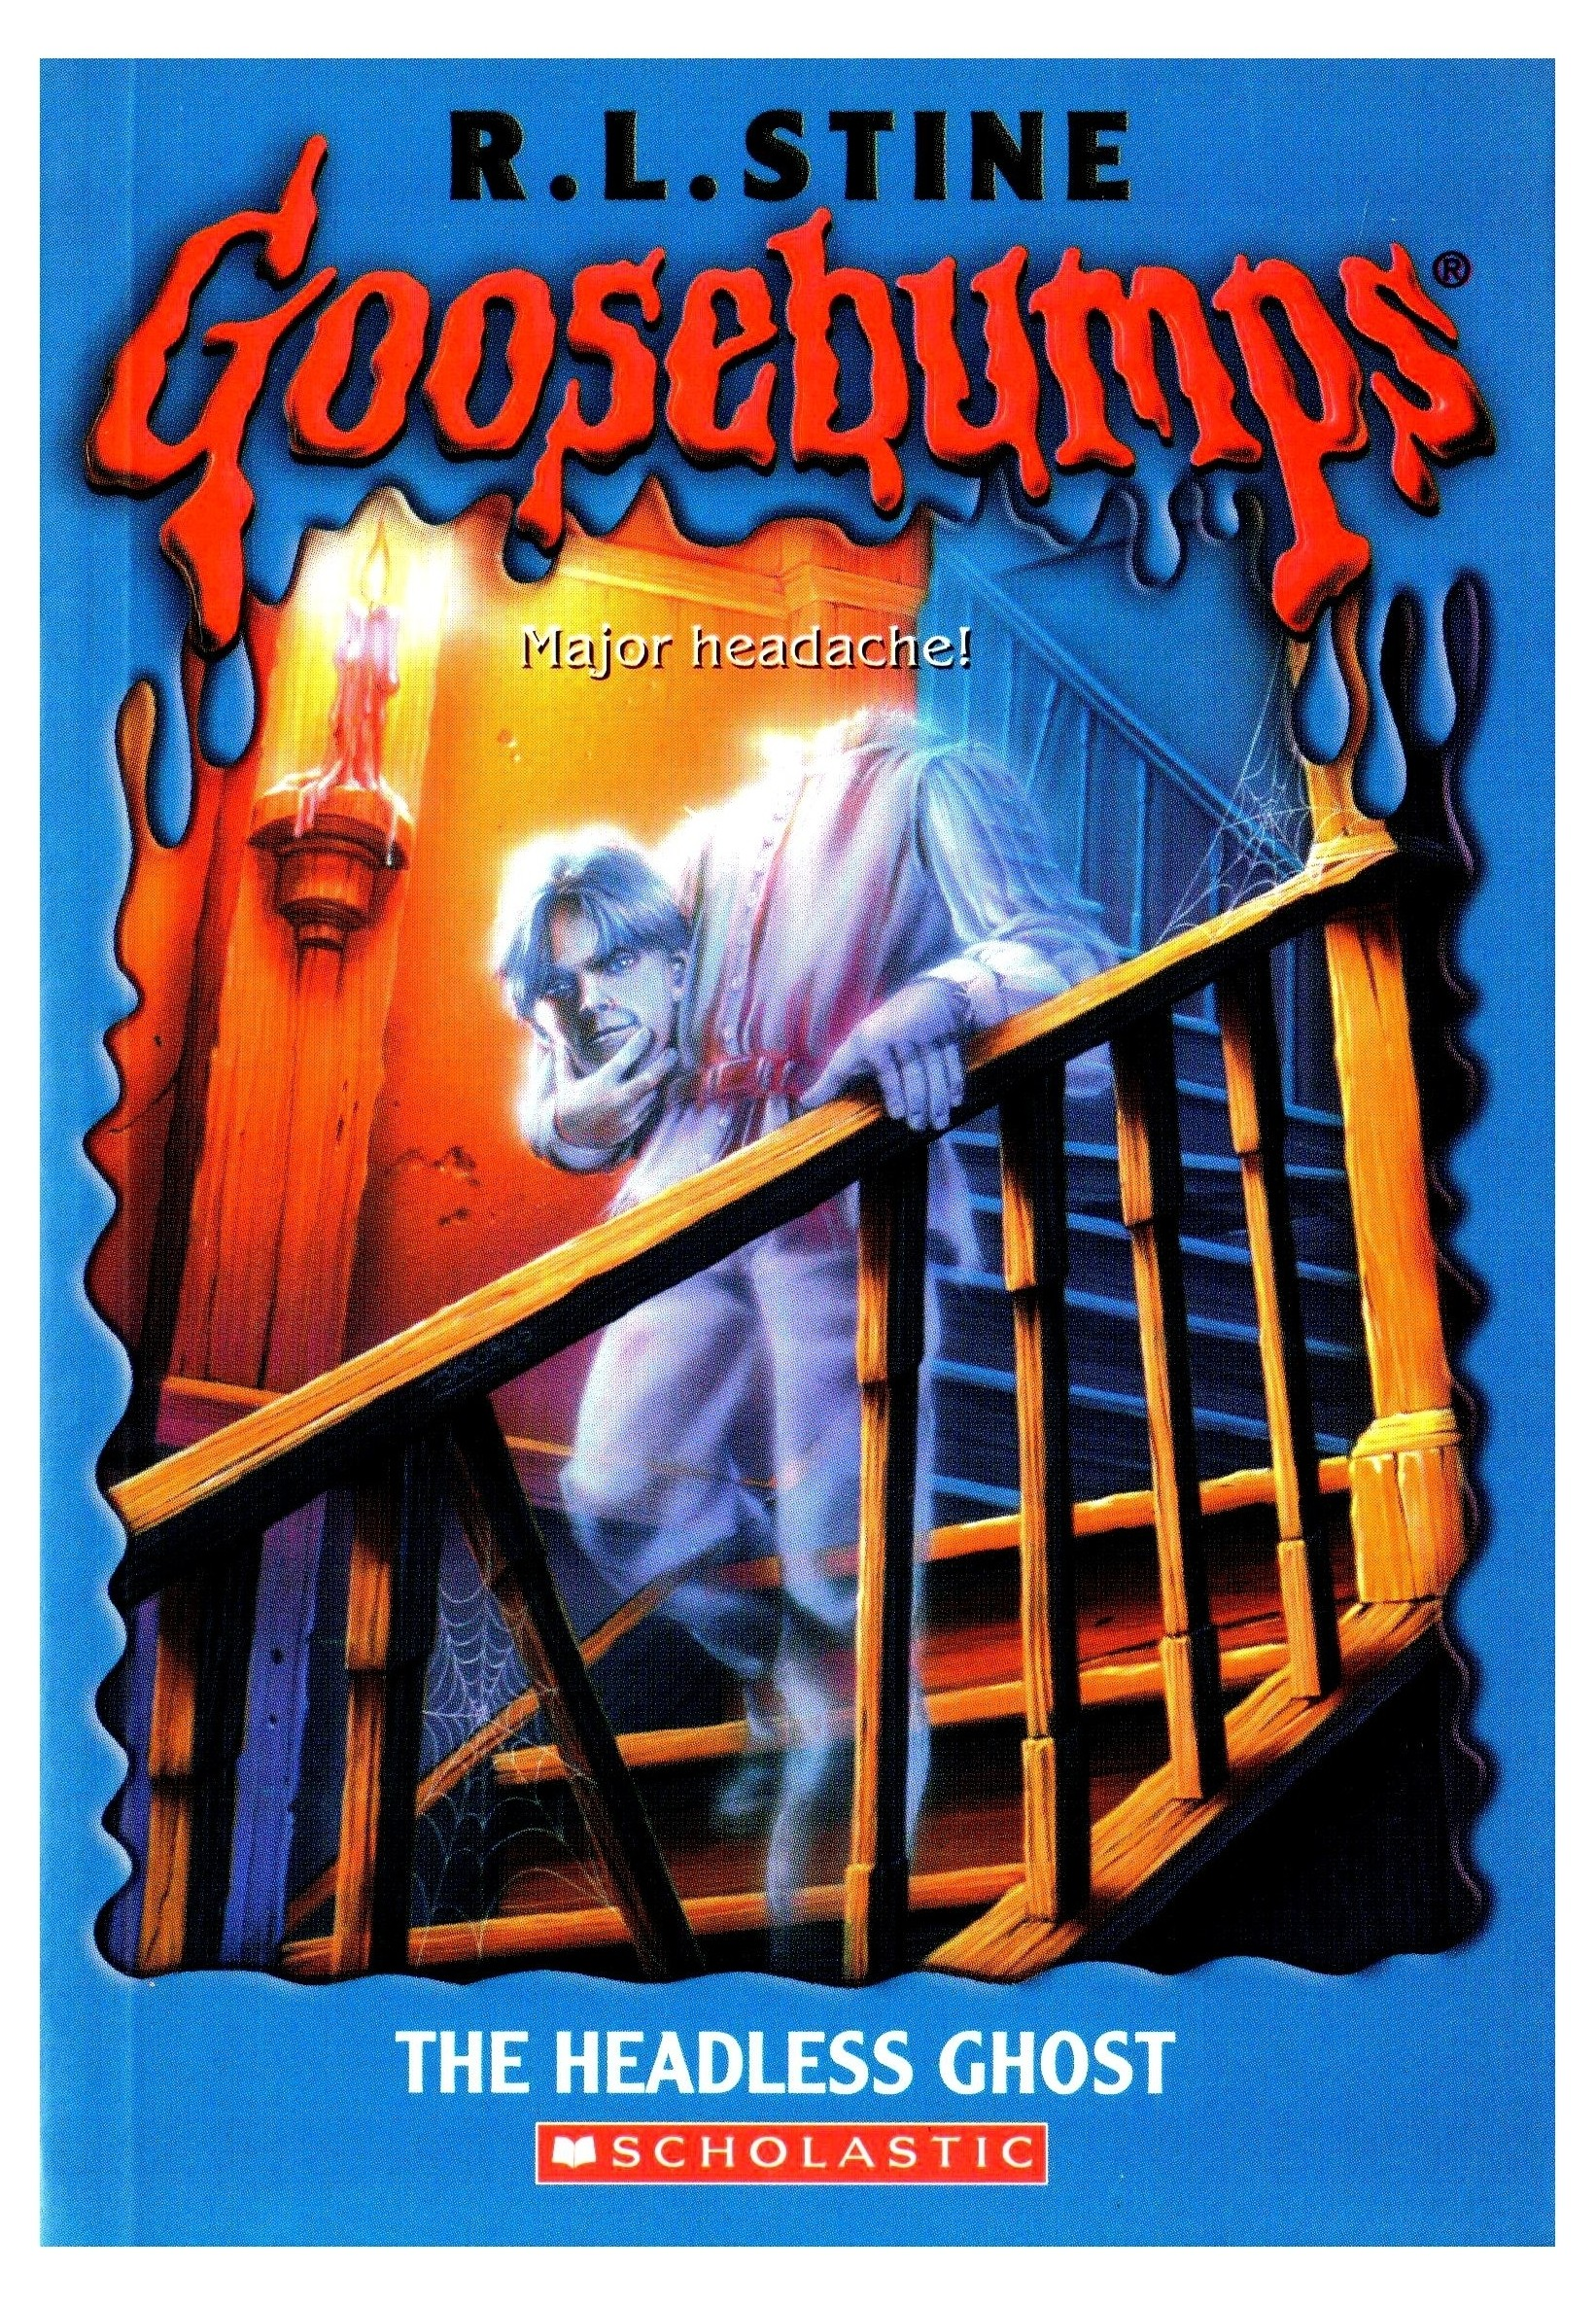 Goosebumps: The Headless Ghost (English) - Buy Goosebumps ...  Goosebumps: The...